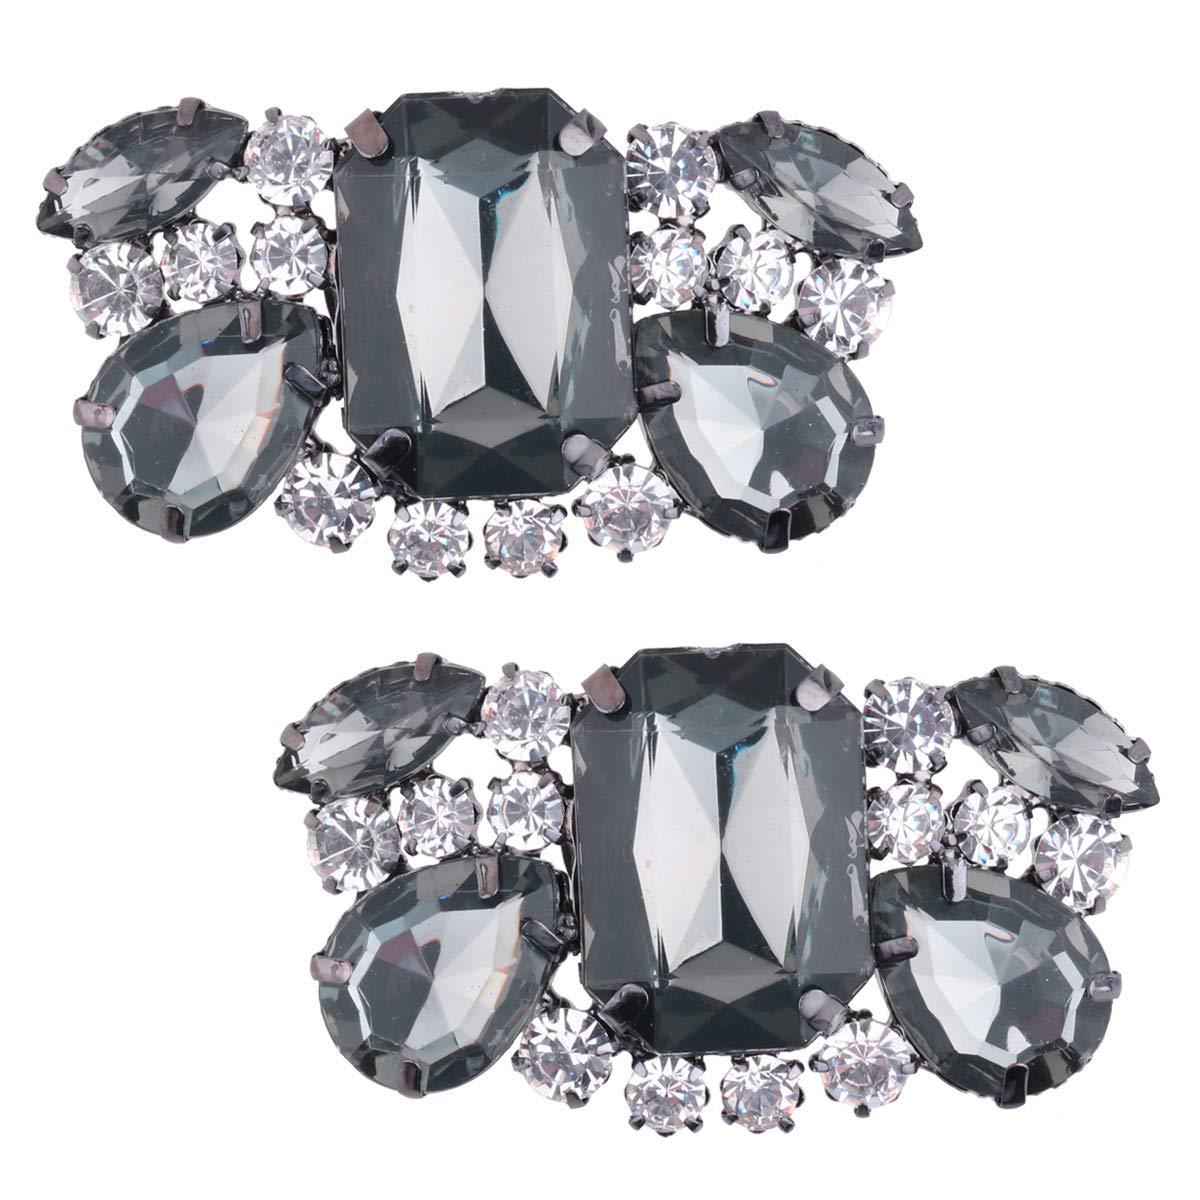 IEFIEL 1 Pair Women Charming Crystal Rhinestones Shoe Clips High Heel Buckle for Wedding Prom Black C One Size